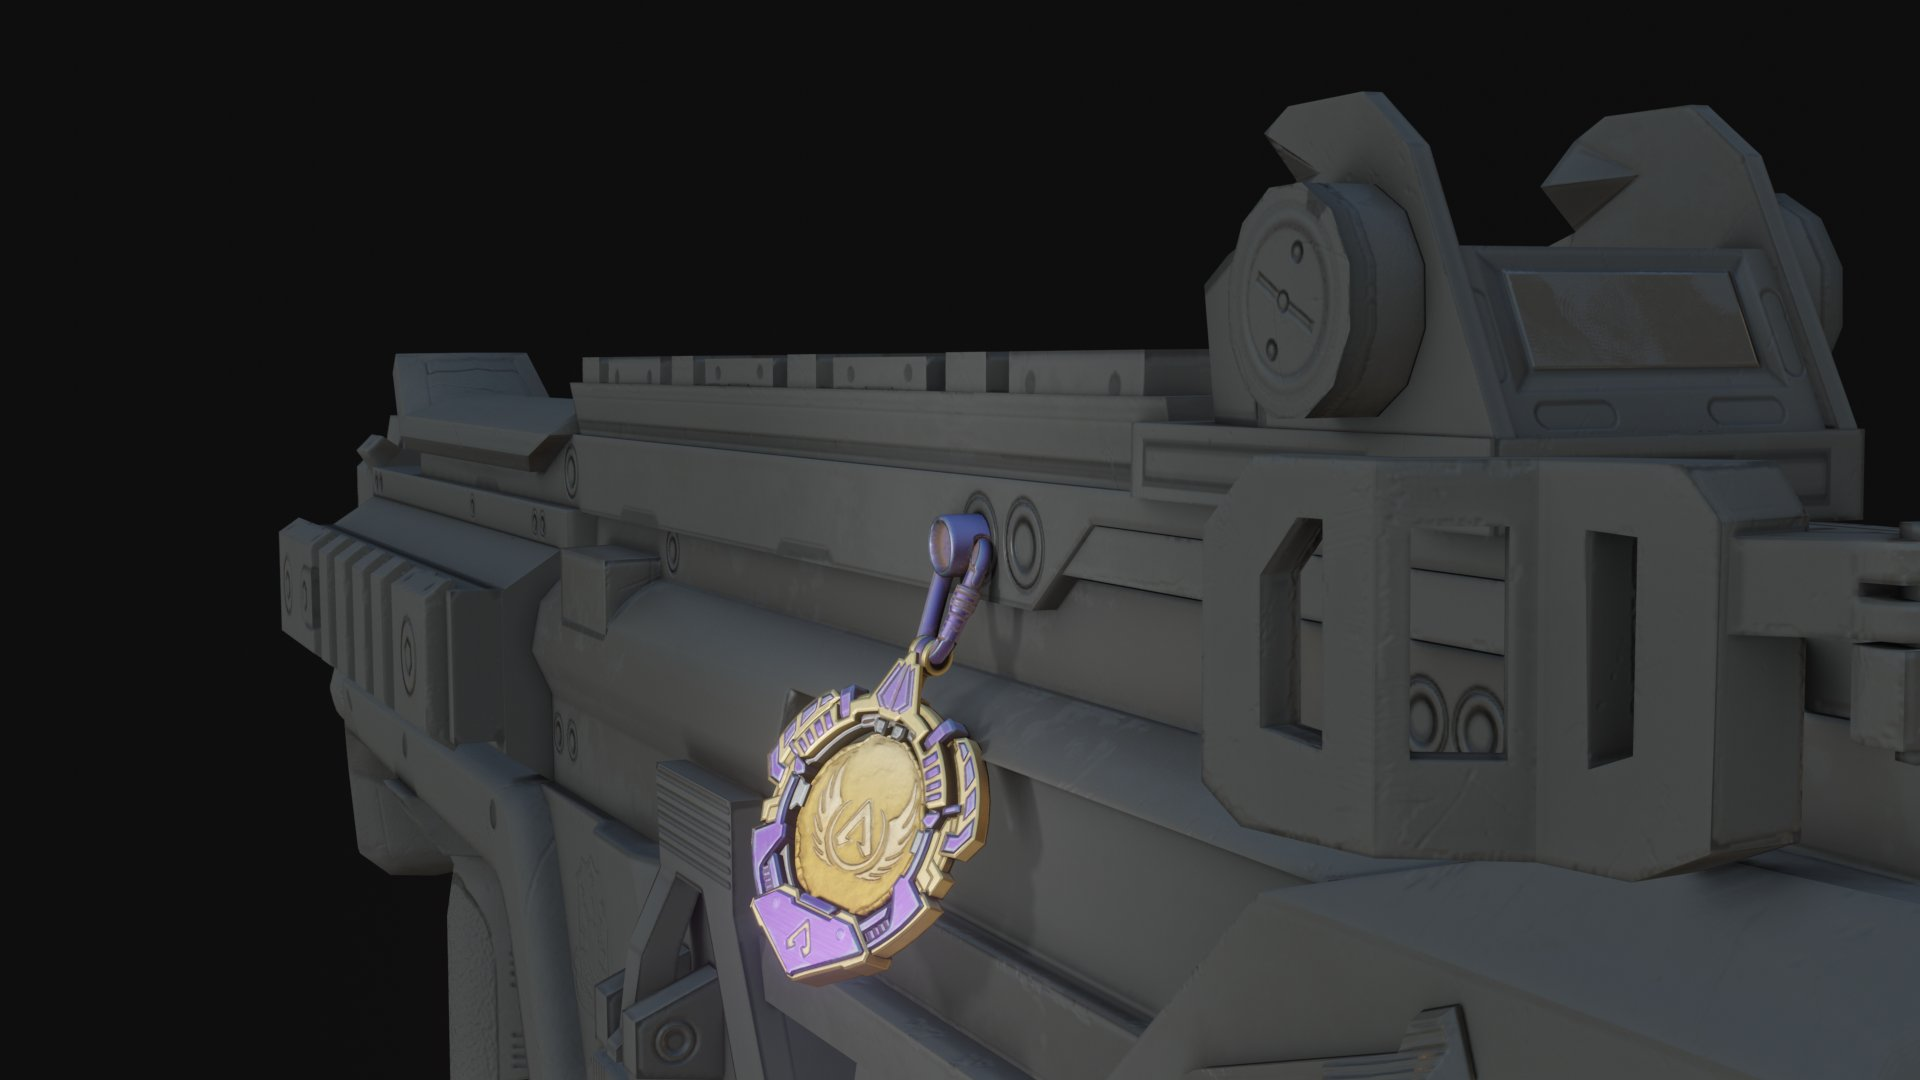 【APEXリーク情報】次のランク報酬(武器チャーム)がリーク!!→これはカッコイイかも!?